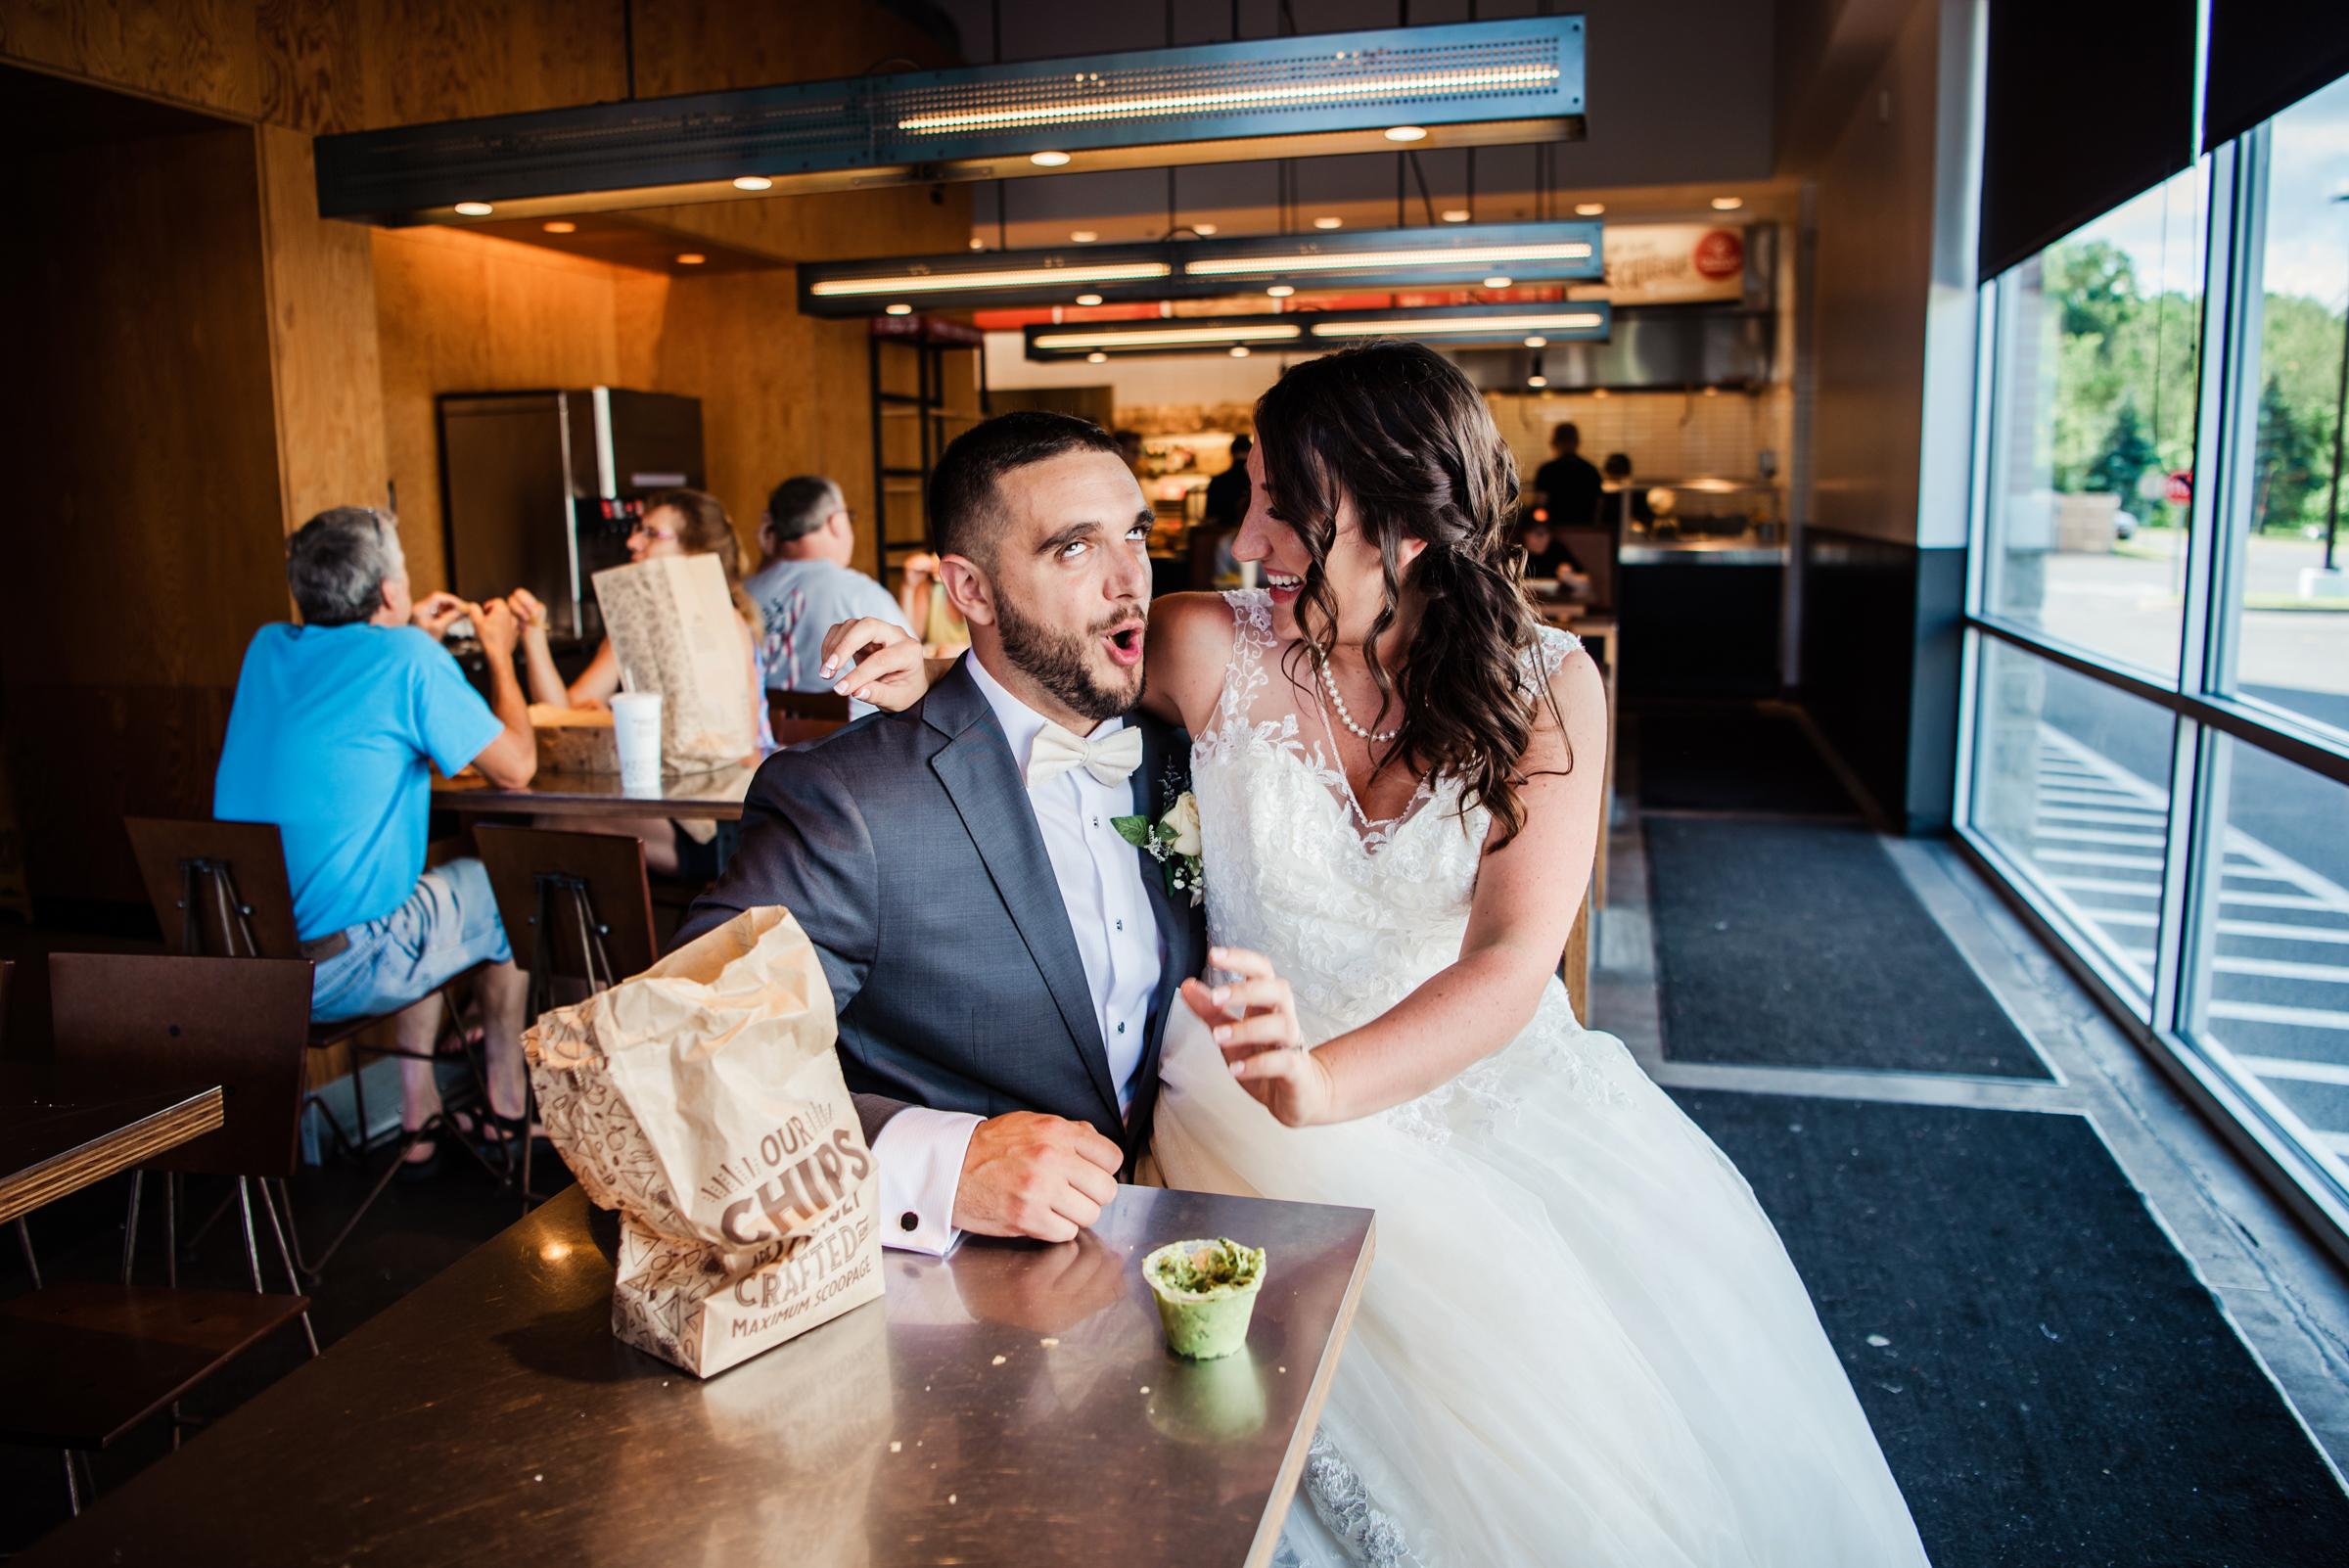 Historic_Old_St_Johns_Church_Valentinos_Banquet_Hall_Central_NY_Wedding_JILL_STUDIO_Rochester_NY_Photographer_DSC_6482.jpg